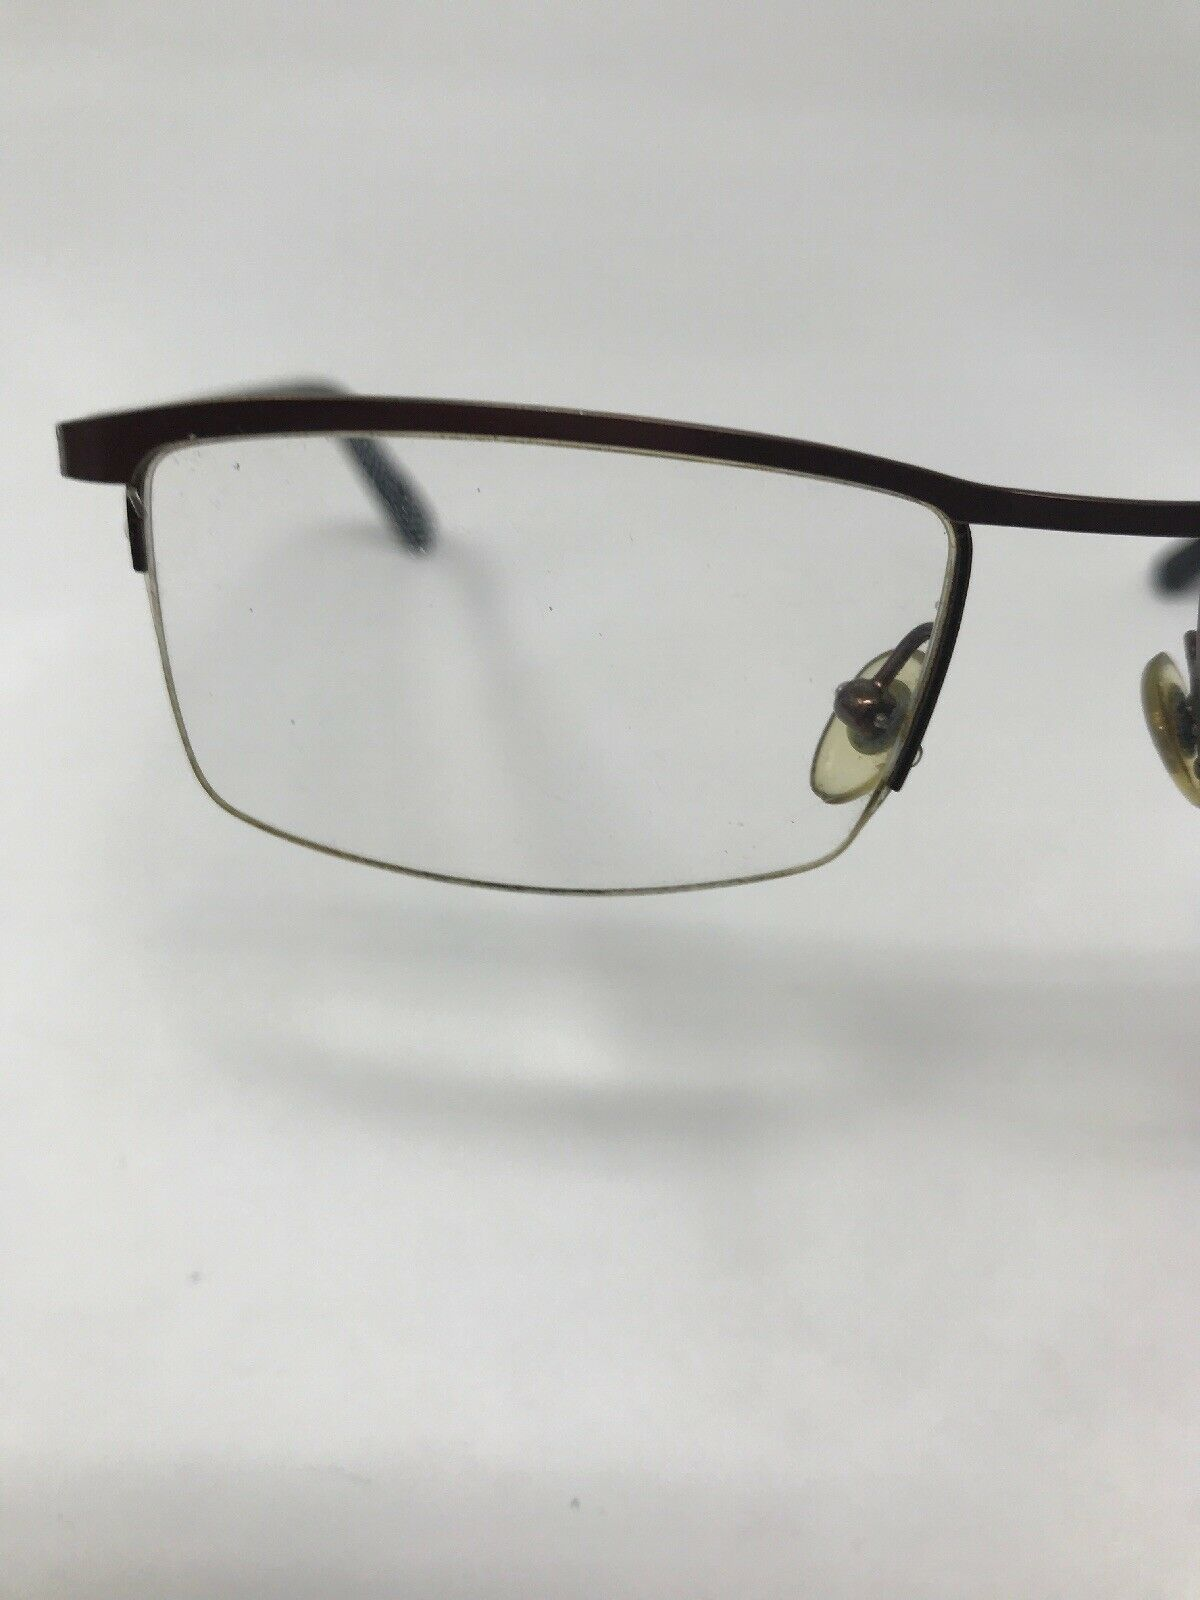 MICHAEL KORS Eyeglasses Frame MK335M 202 Half Rimless 51-17-140 Brown YP82